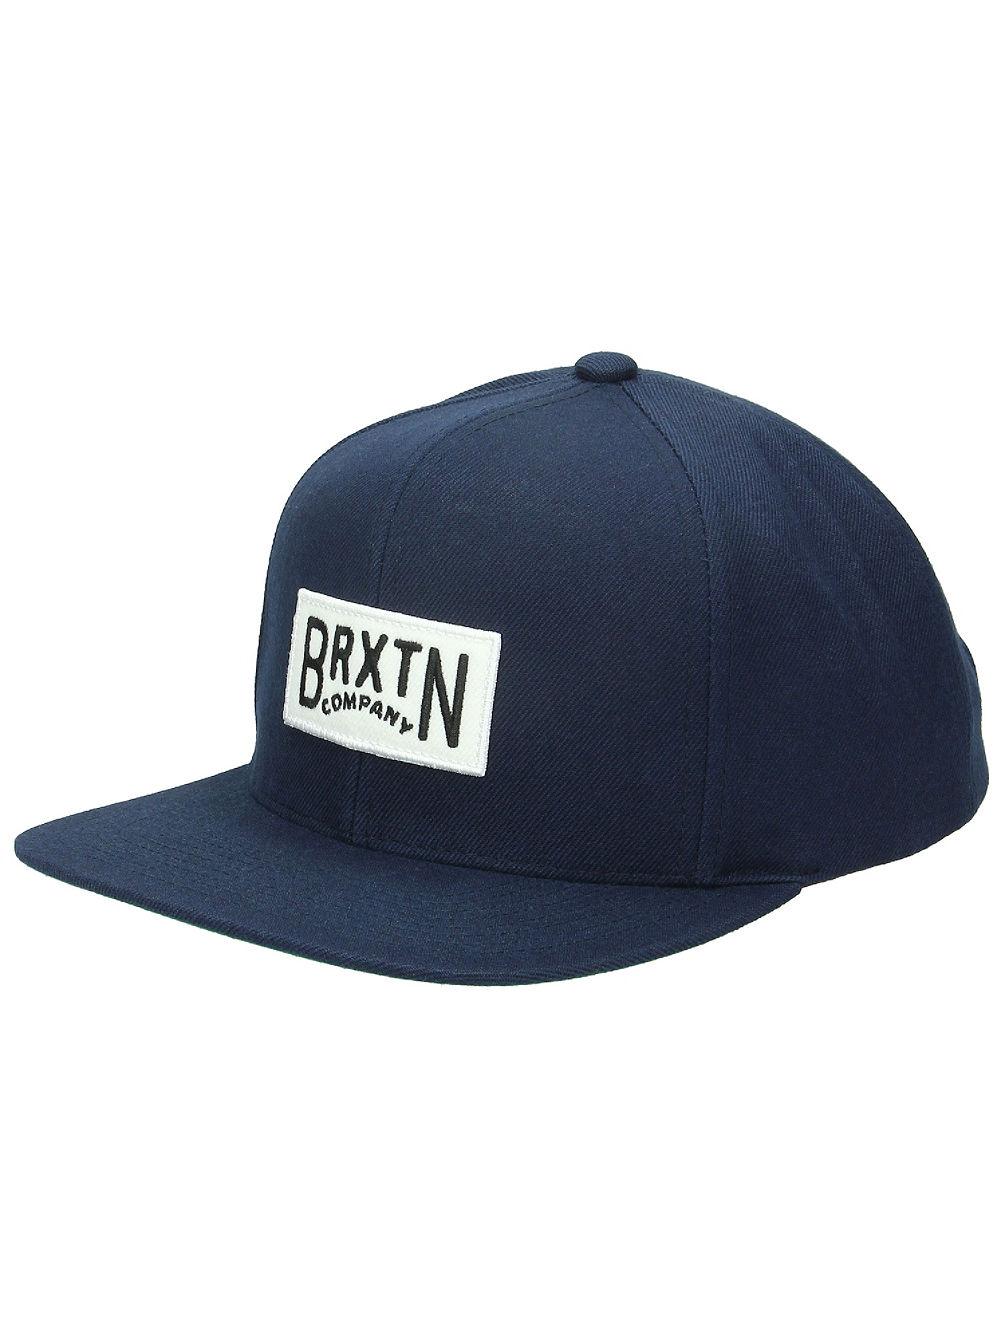 brixton-langley-snapback-cap